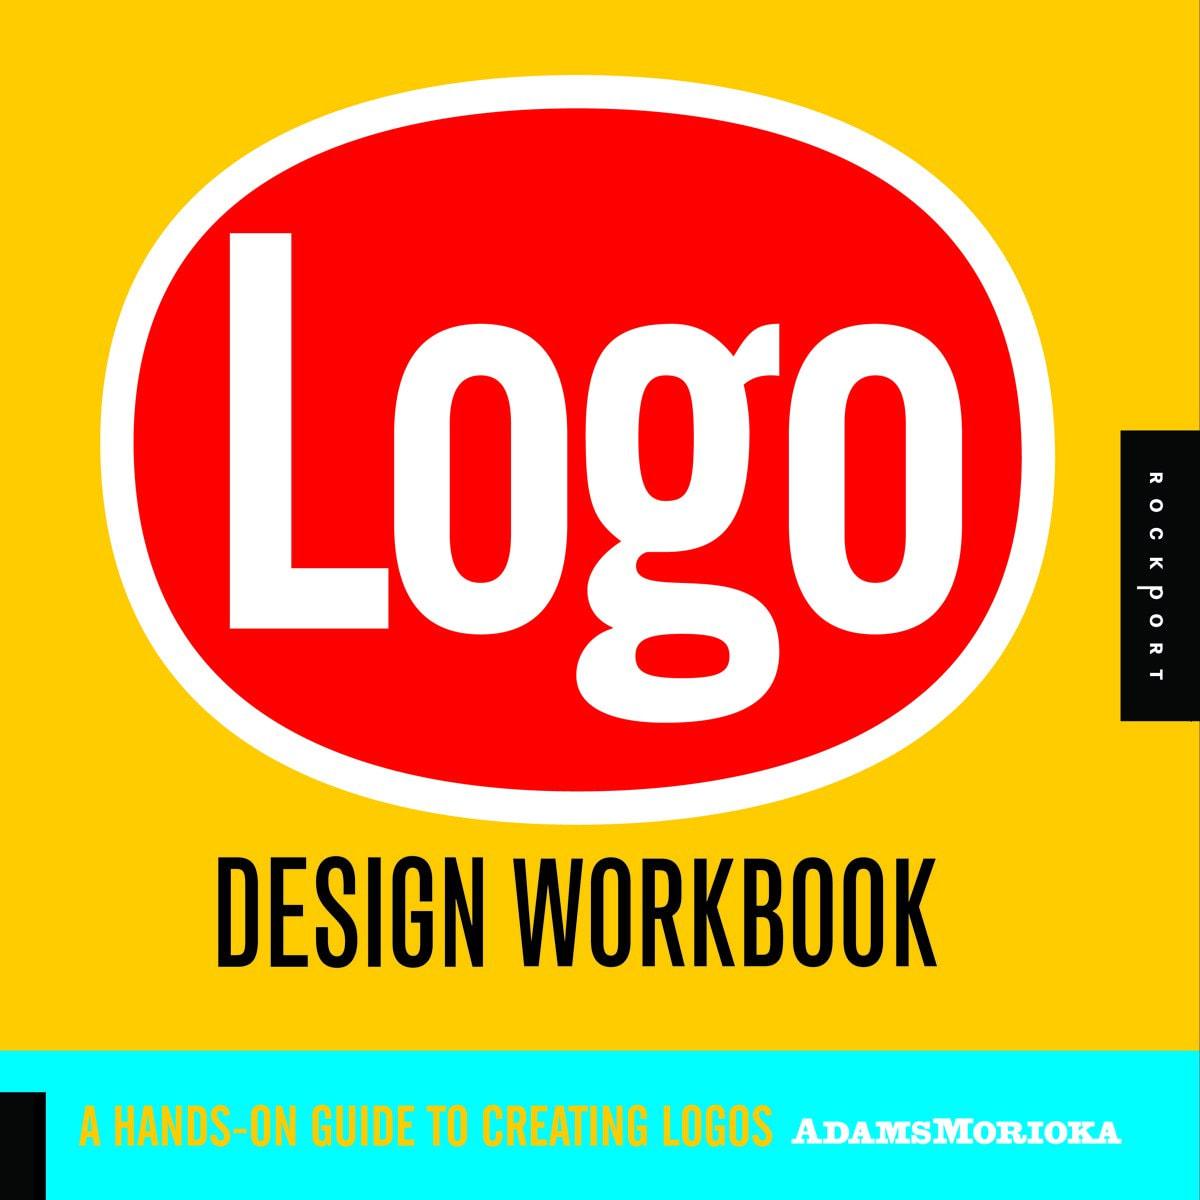 LOGOWB_new_cover_CS1.indd